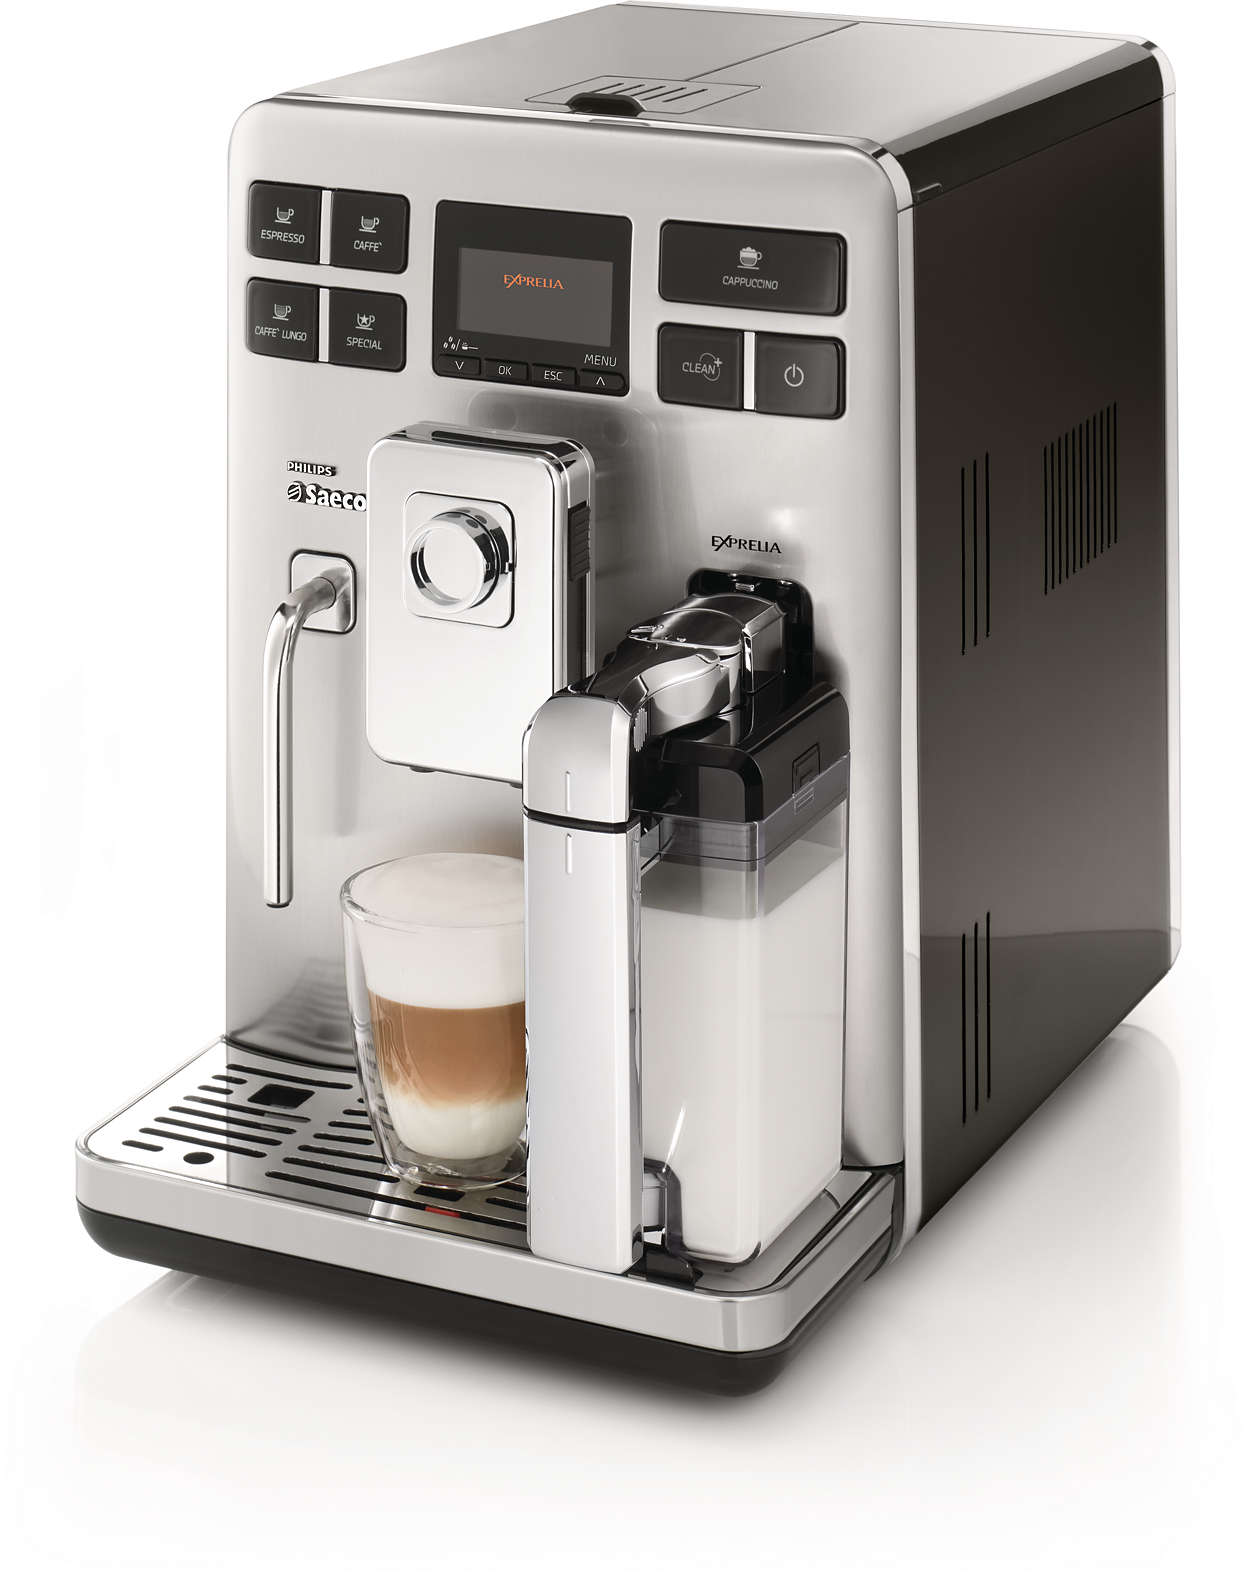 exprelia kaffeevollautomat hd8854 01 saeco. Black Bedroom Furniture Sets. Home Design Ideas